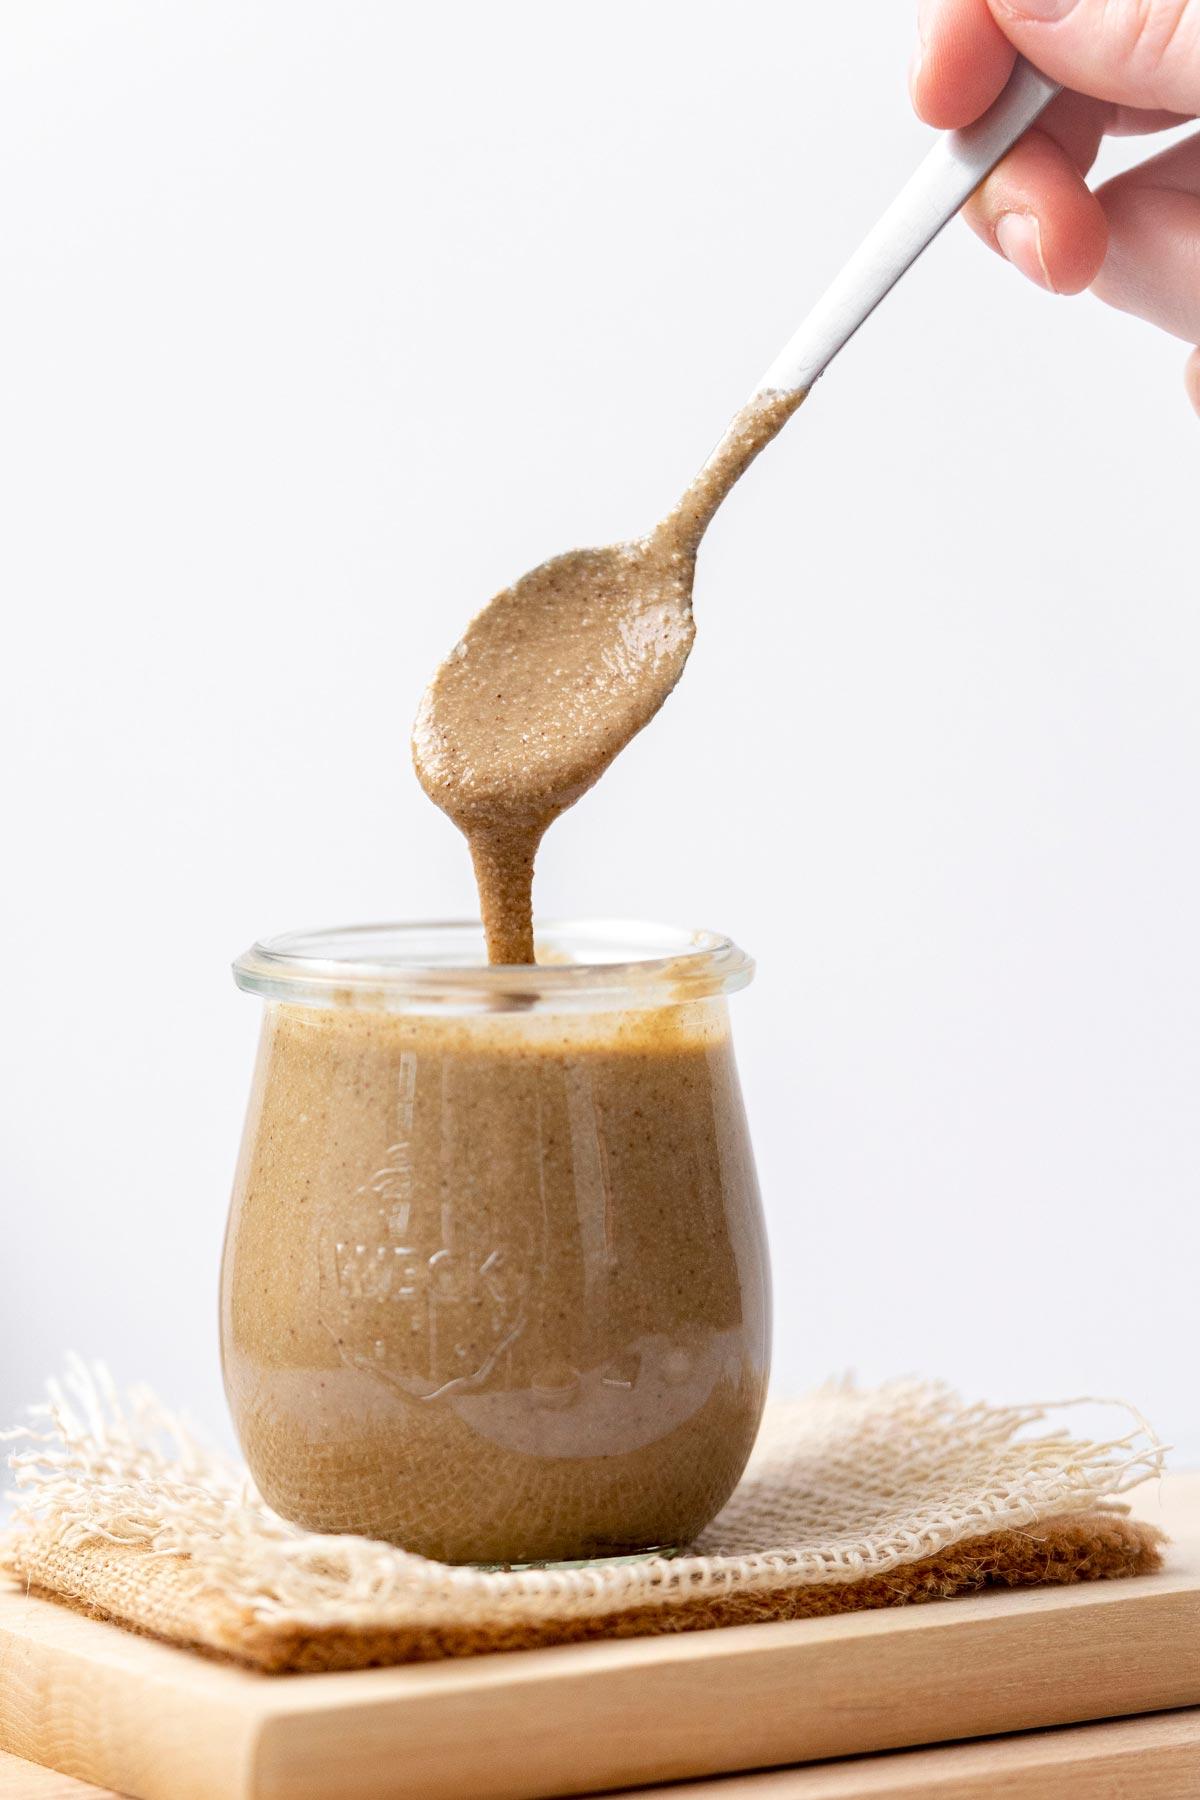 Spoon drizzling homemade tahini into small jar